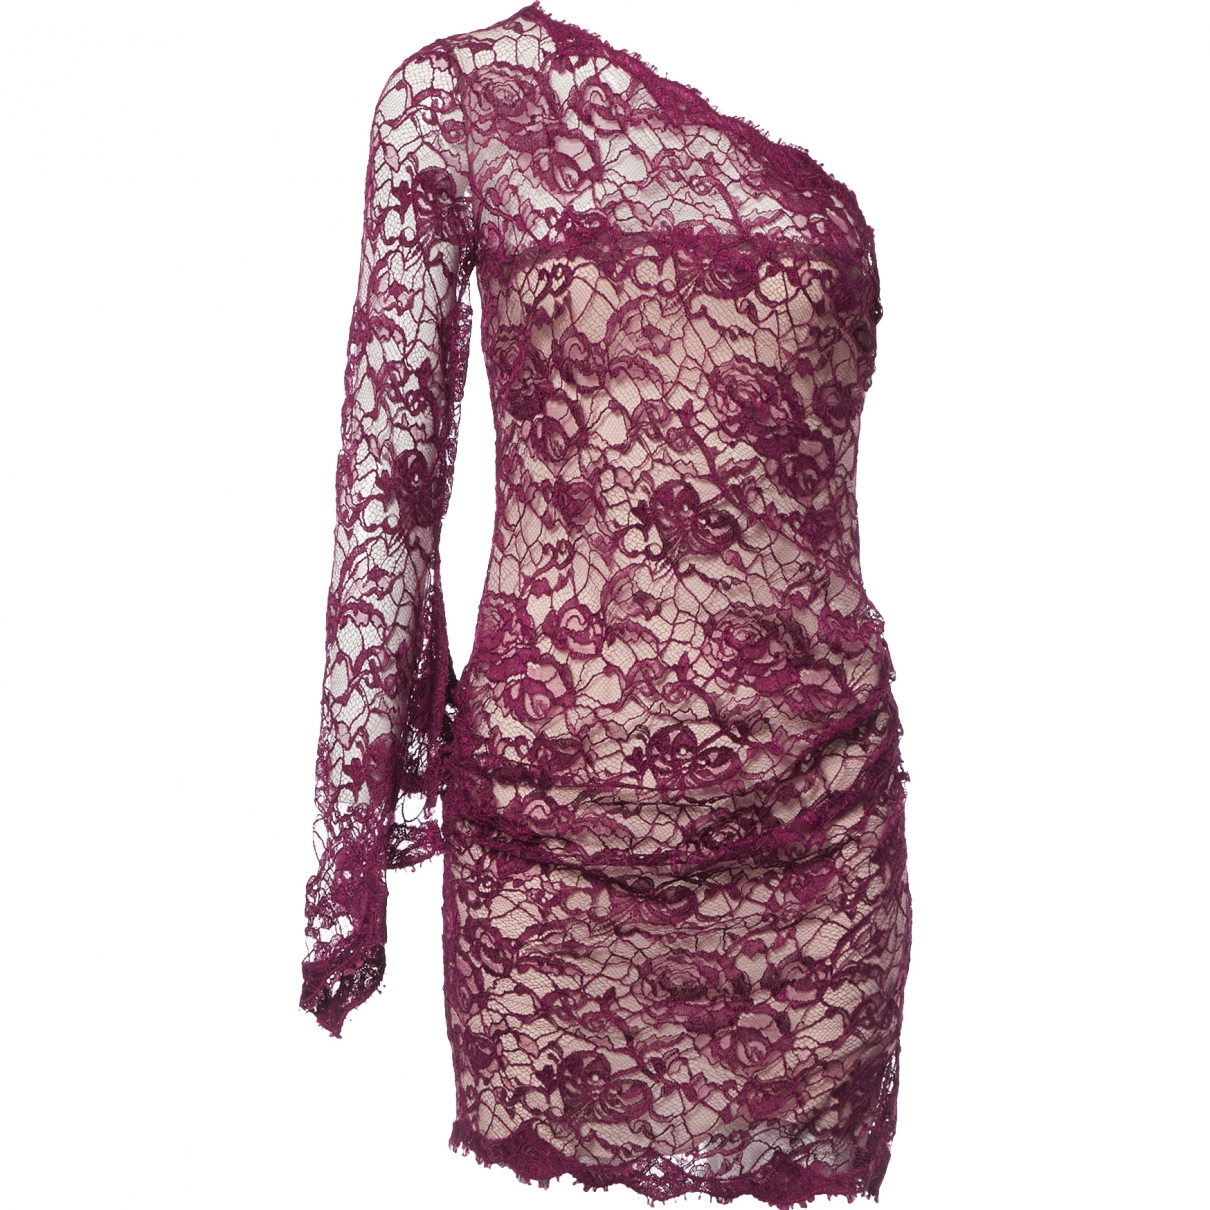 Emilio Pucci \N Purple Lace dress for Women 40 IT